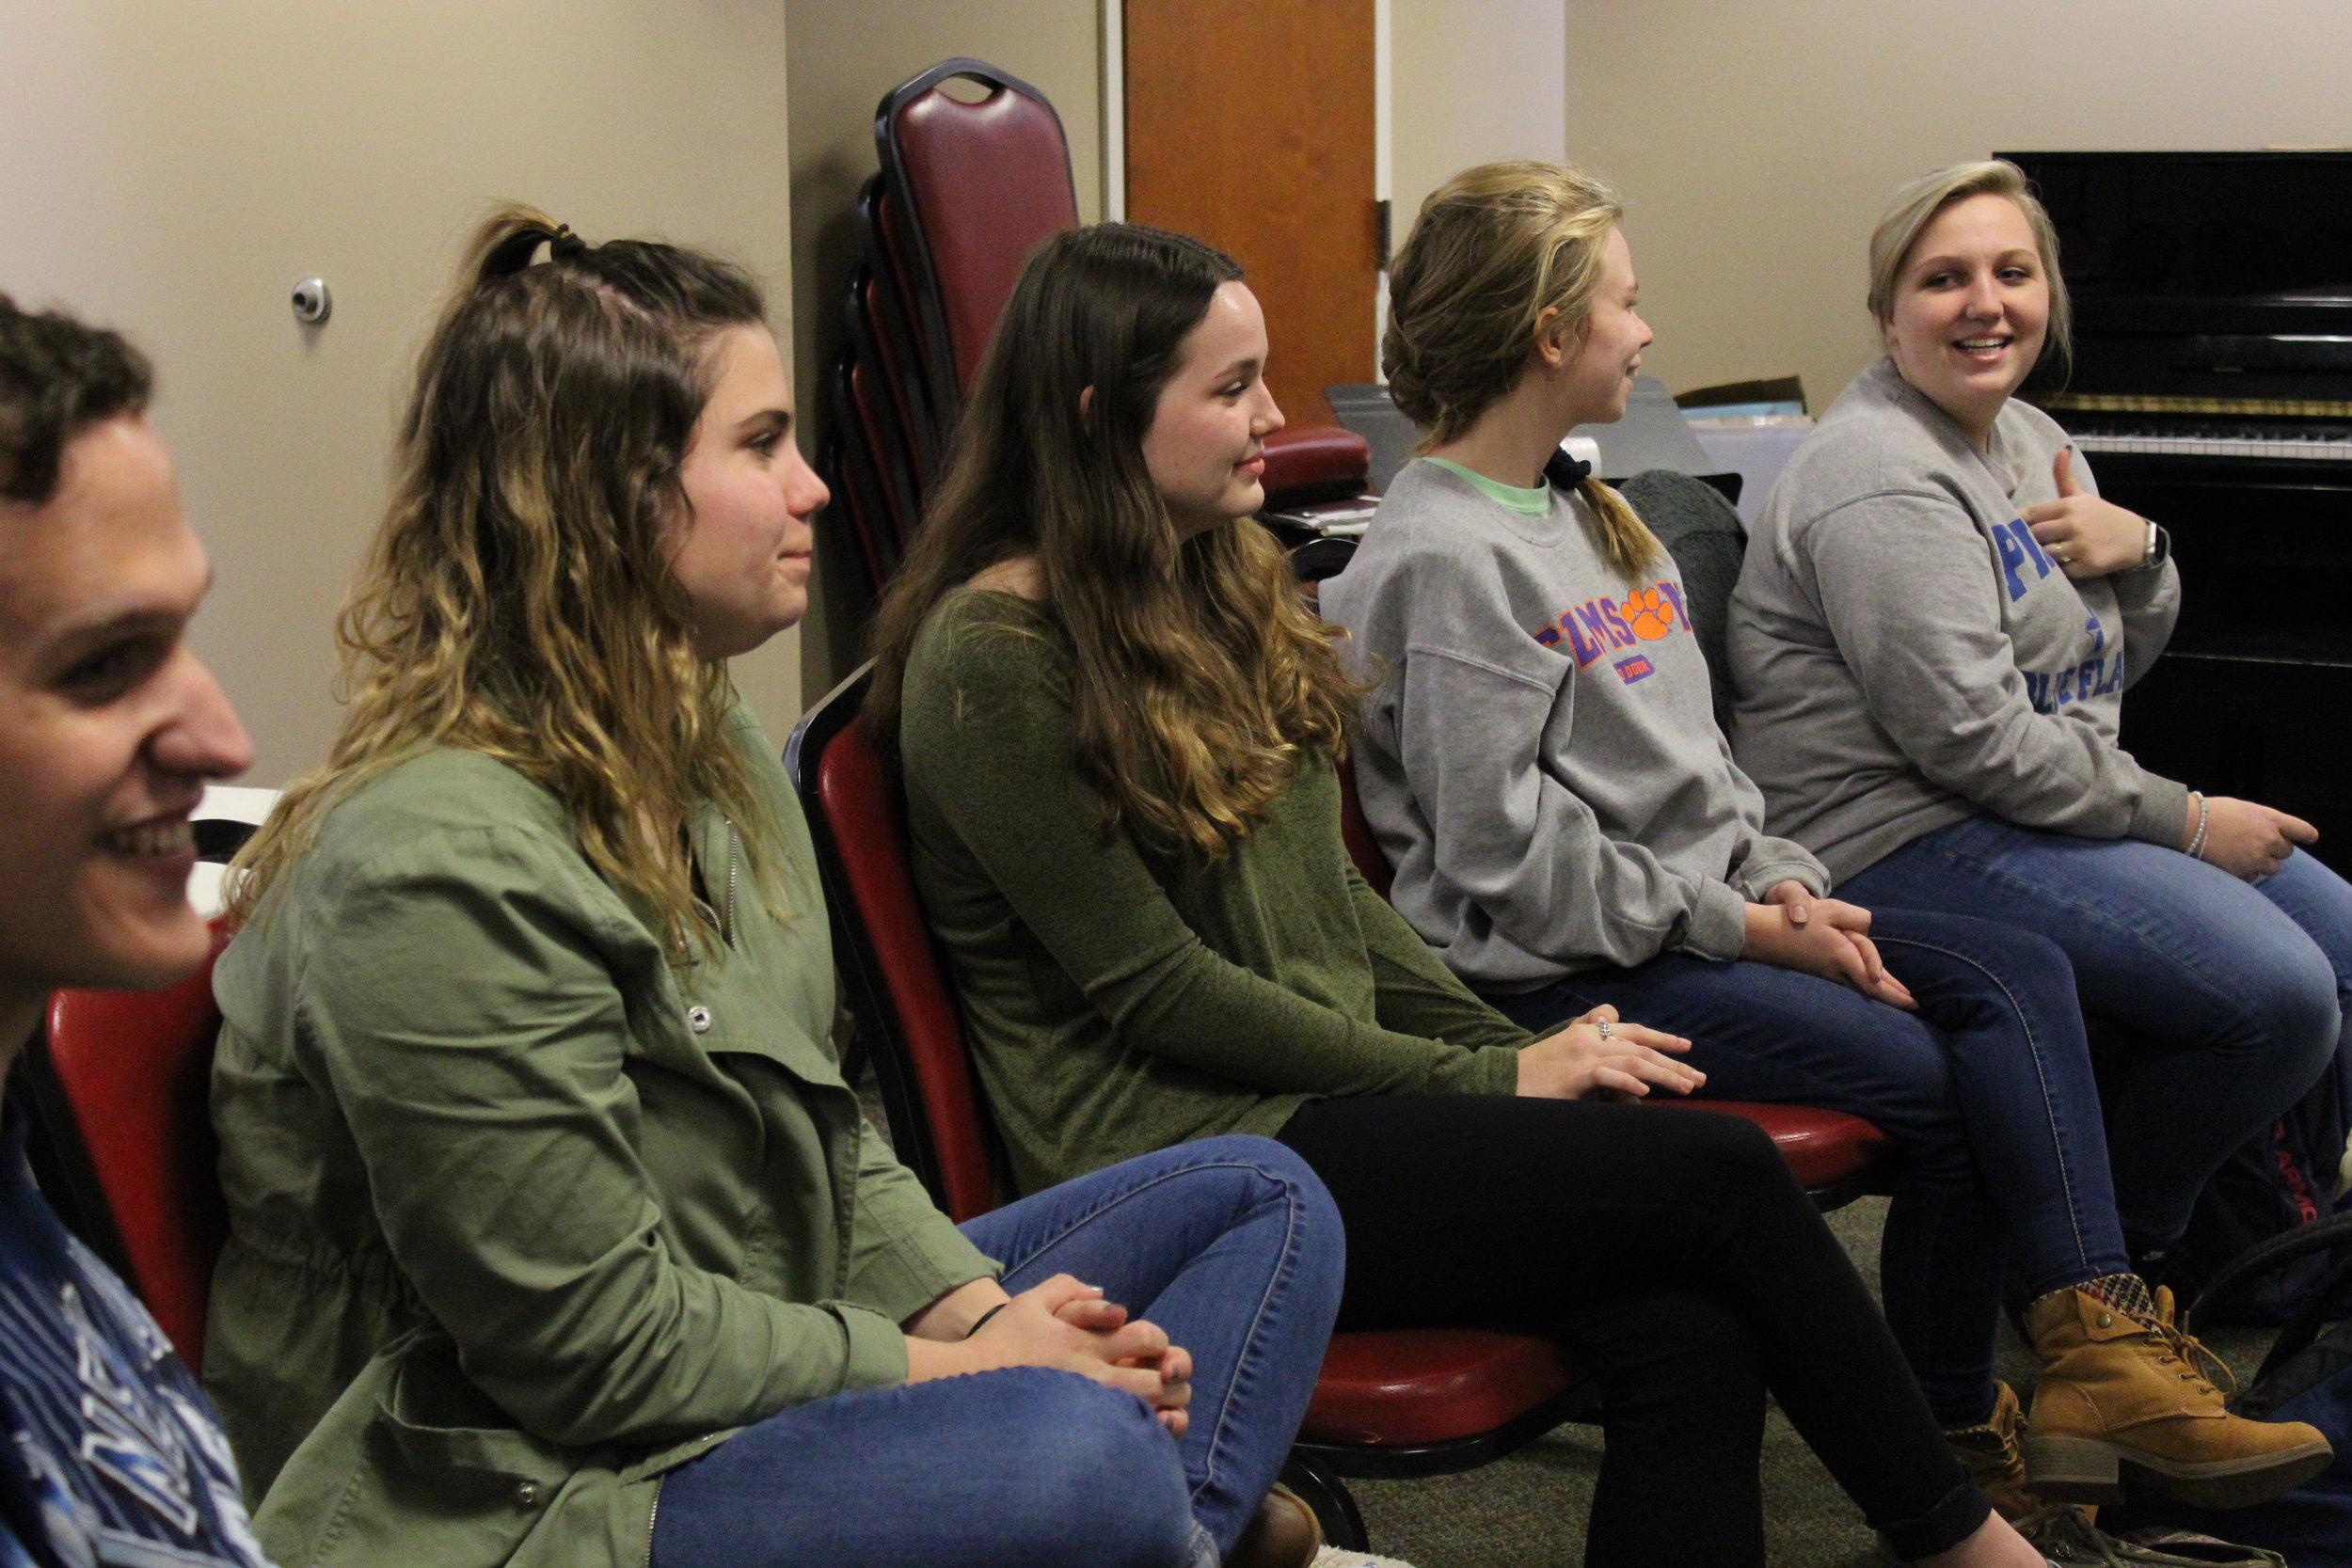 Students Elliot Corbin (junior), Alexandra Haver (freshman), Olivia Stromlund (freshman), Faith Bentley (freshman), and Megan Wyatt (freshman) take turns going around introducing themselves and sharing their relationship status.